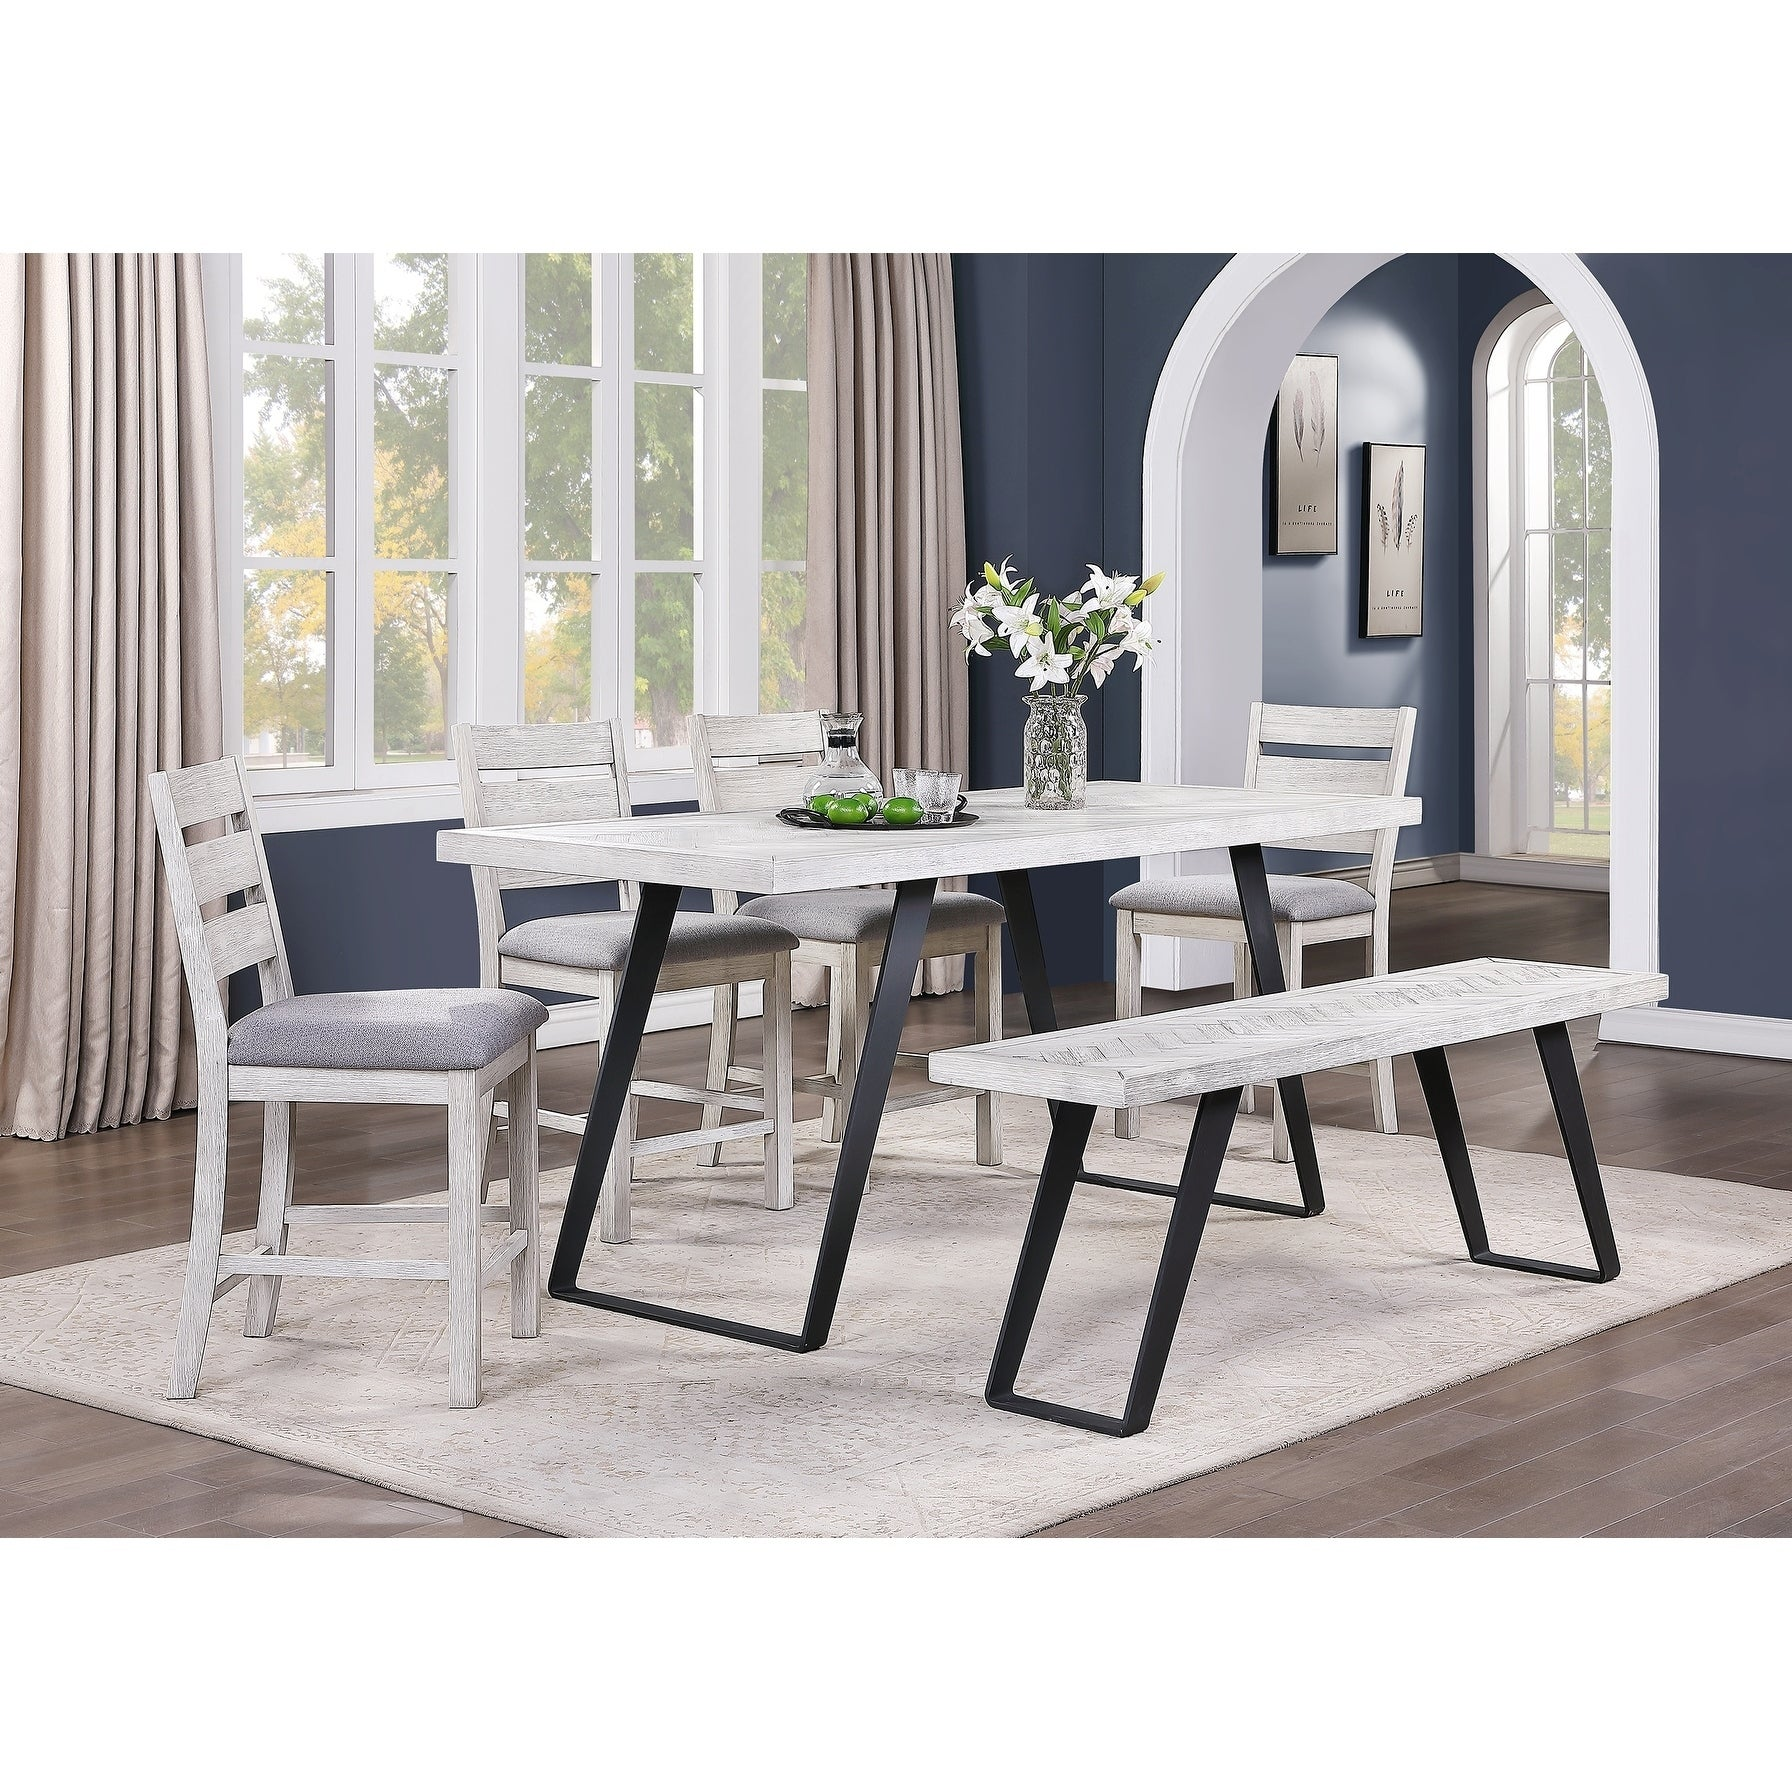 Somette Aspen Court Ii Herringbone White Rub Counter Height Dining Table 34 W X 80 L X 36 H Overstock 30394677